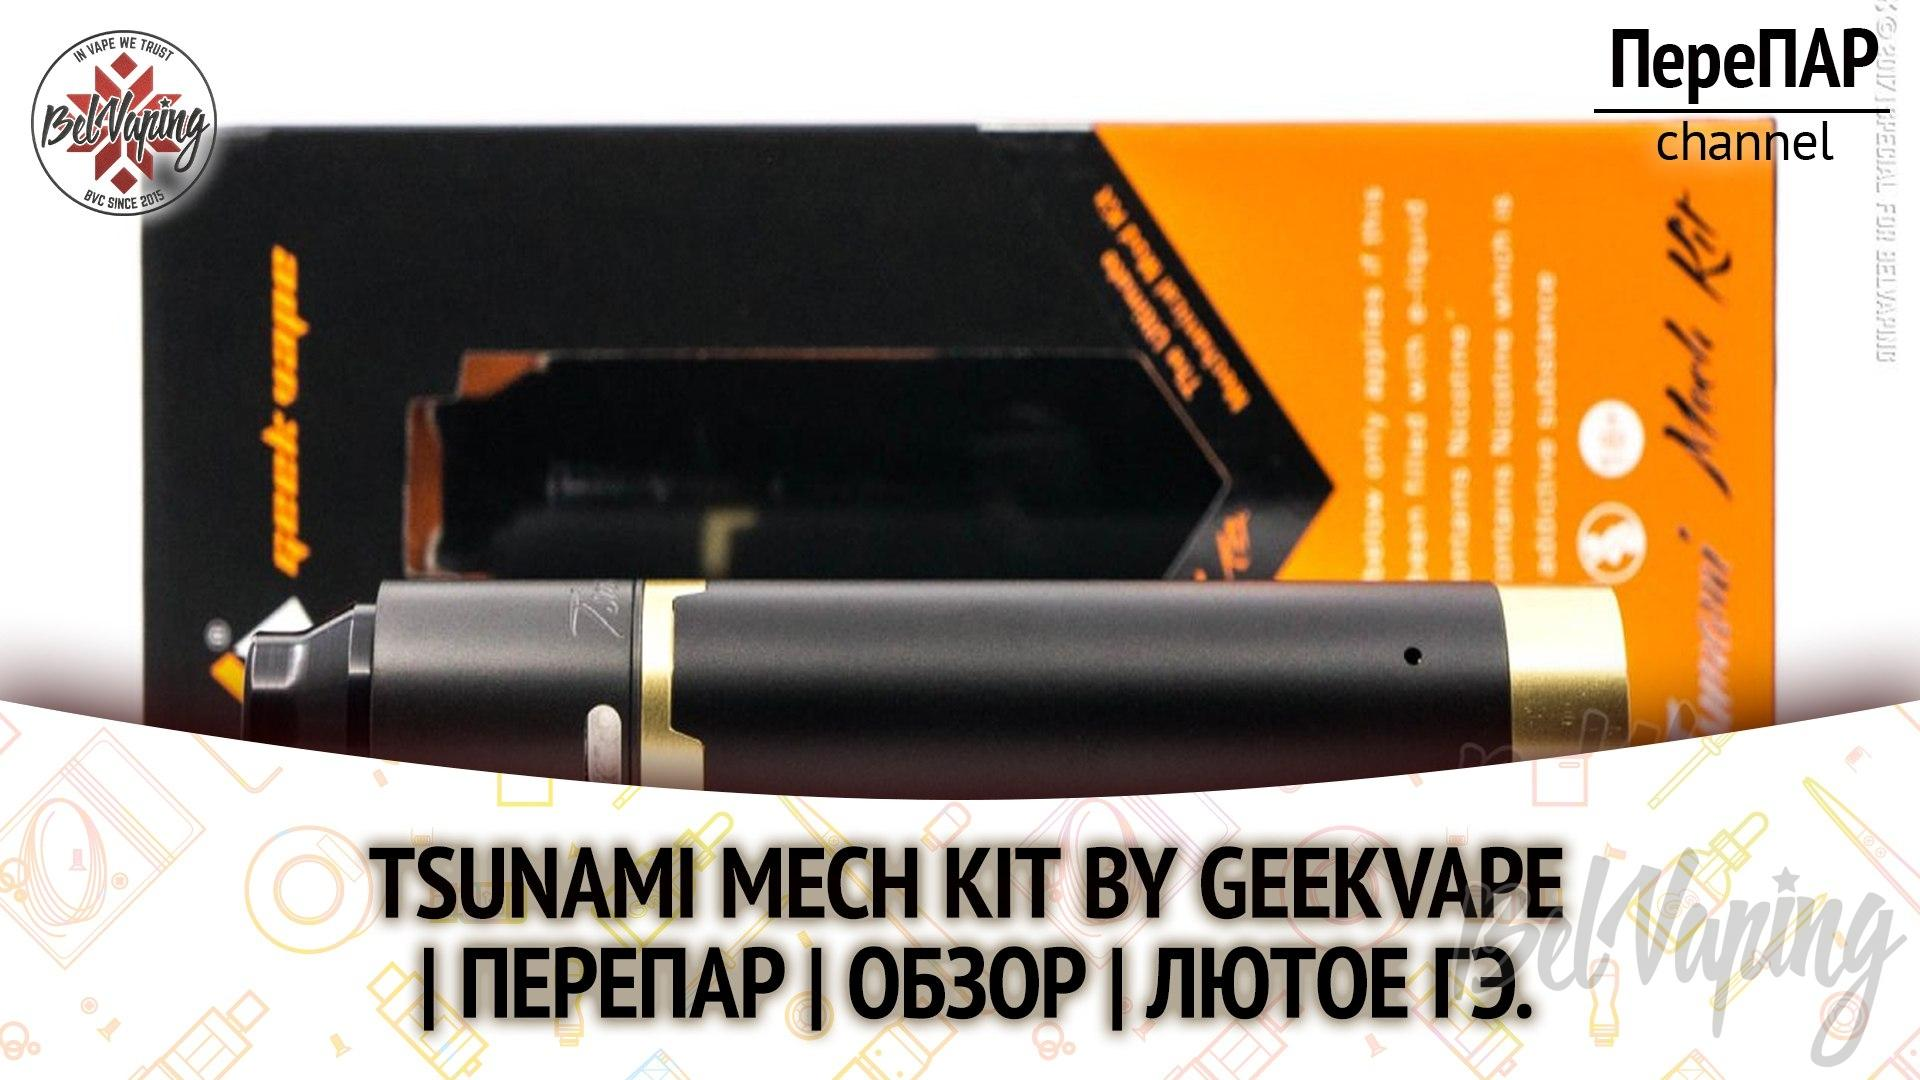 Обзор набора Тsunami Mech Kit от Geekvape